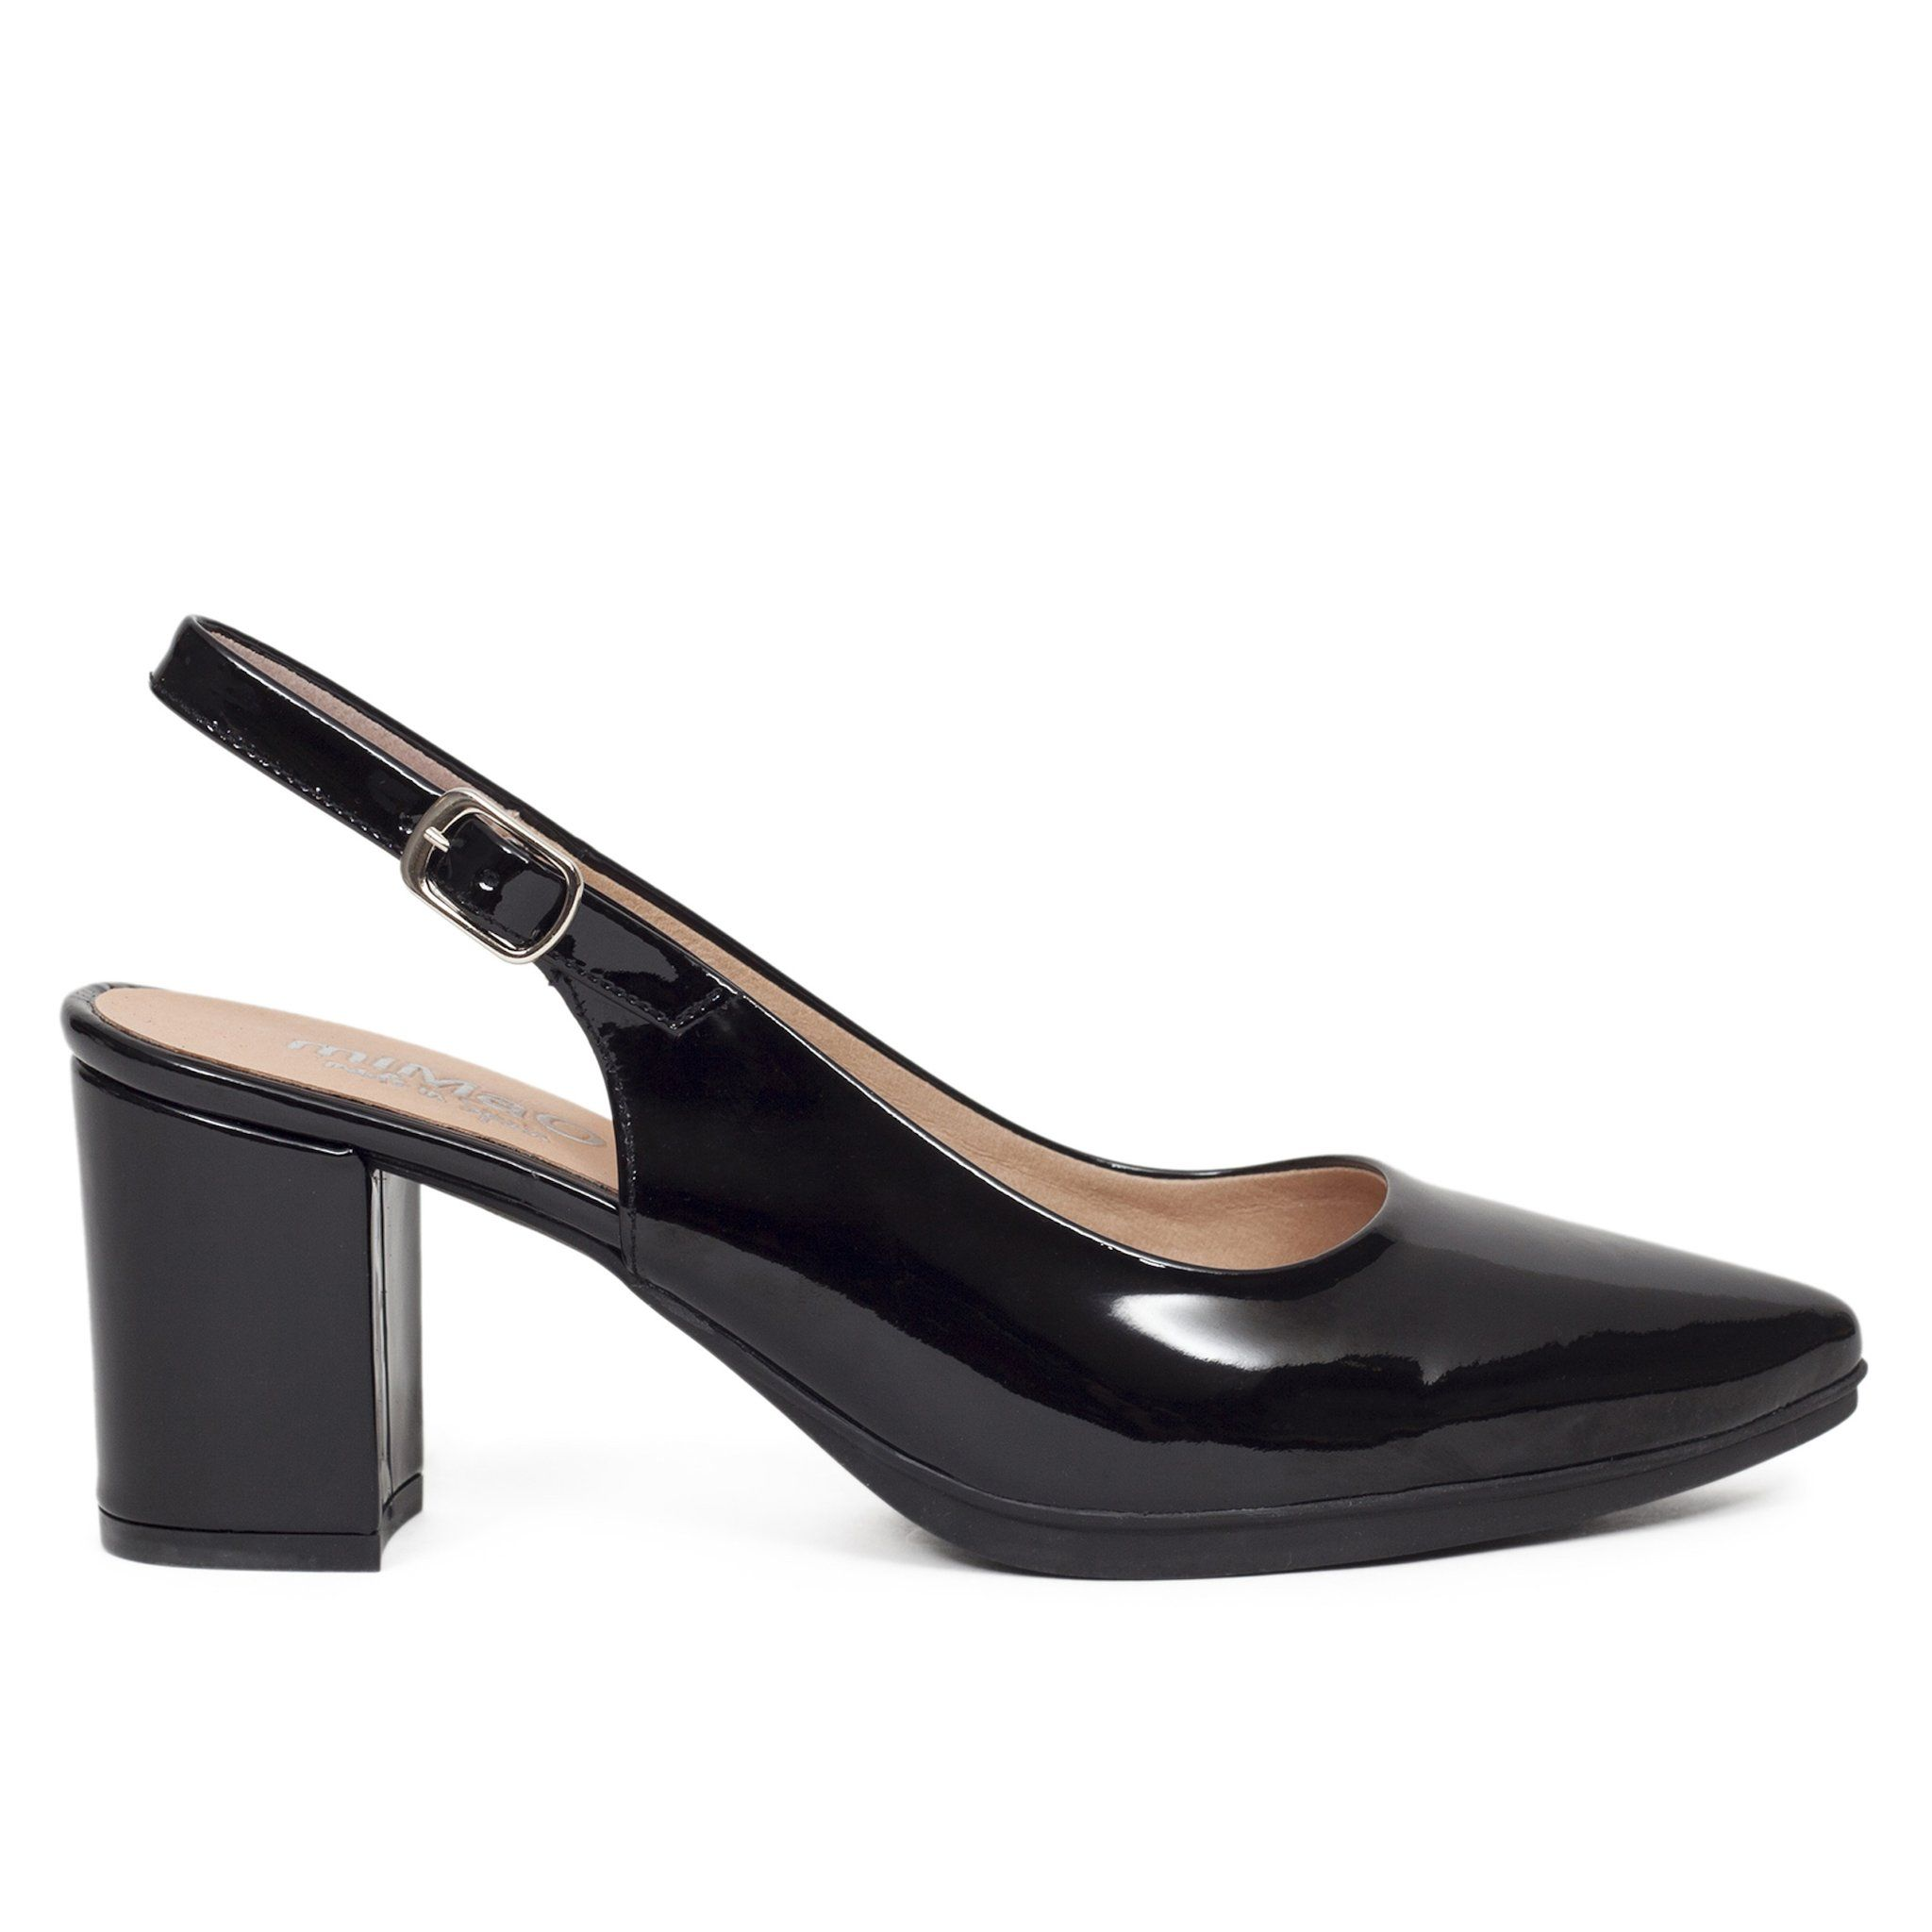 ZAPATO CHAROL DESTALONADO NEGRO MUJER – Zapatos Online miMaO Spain – miMaO  ShopOnline 00e922091864